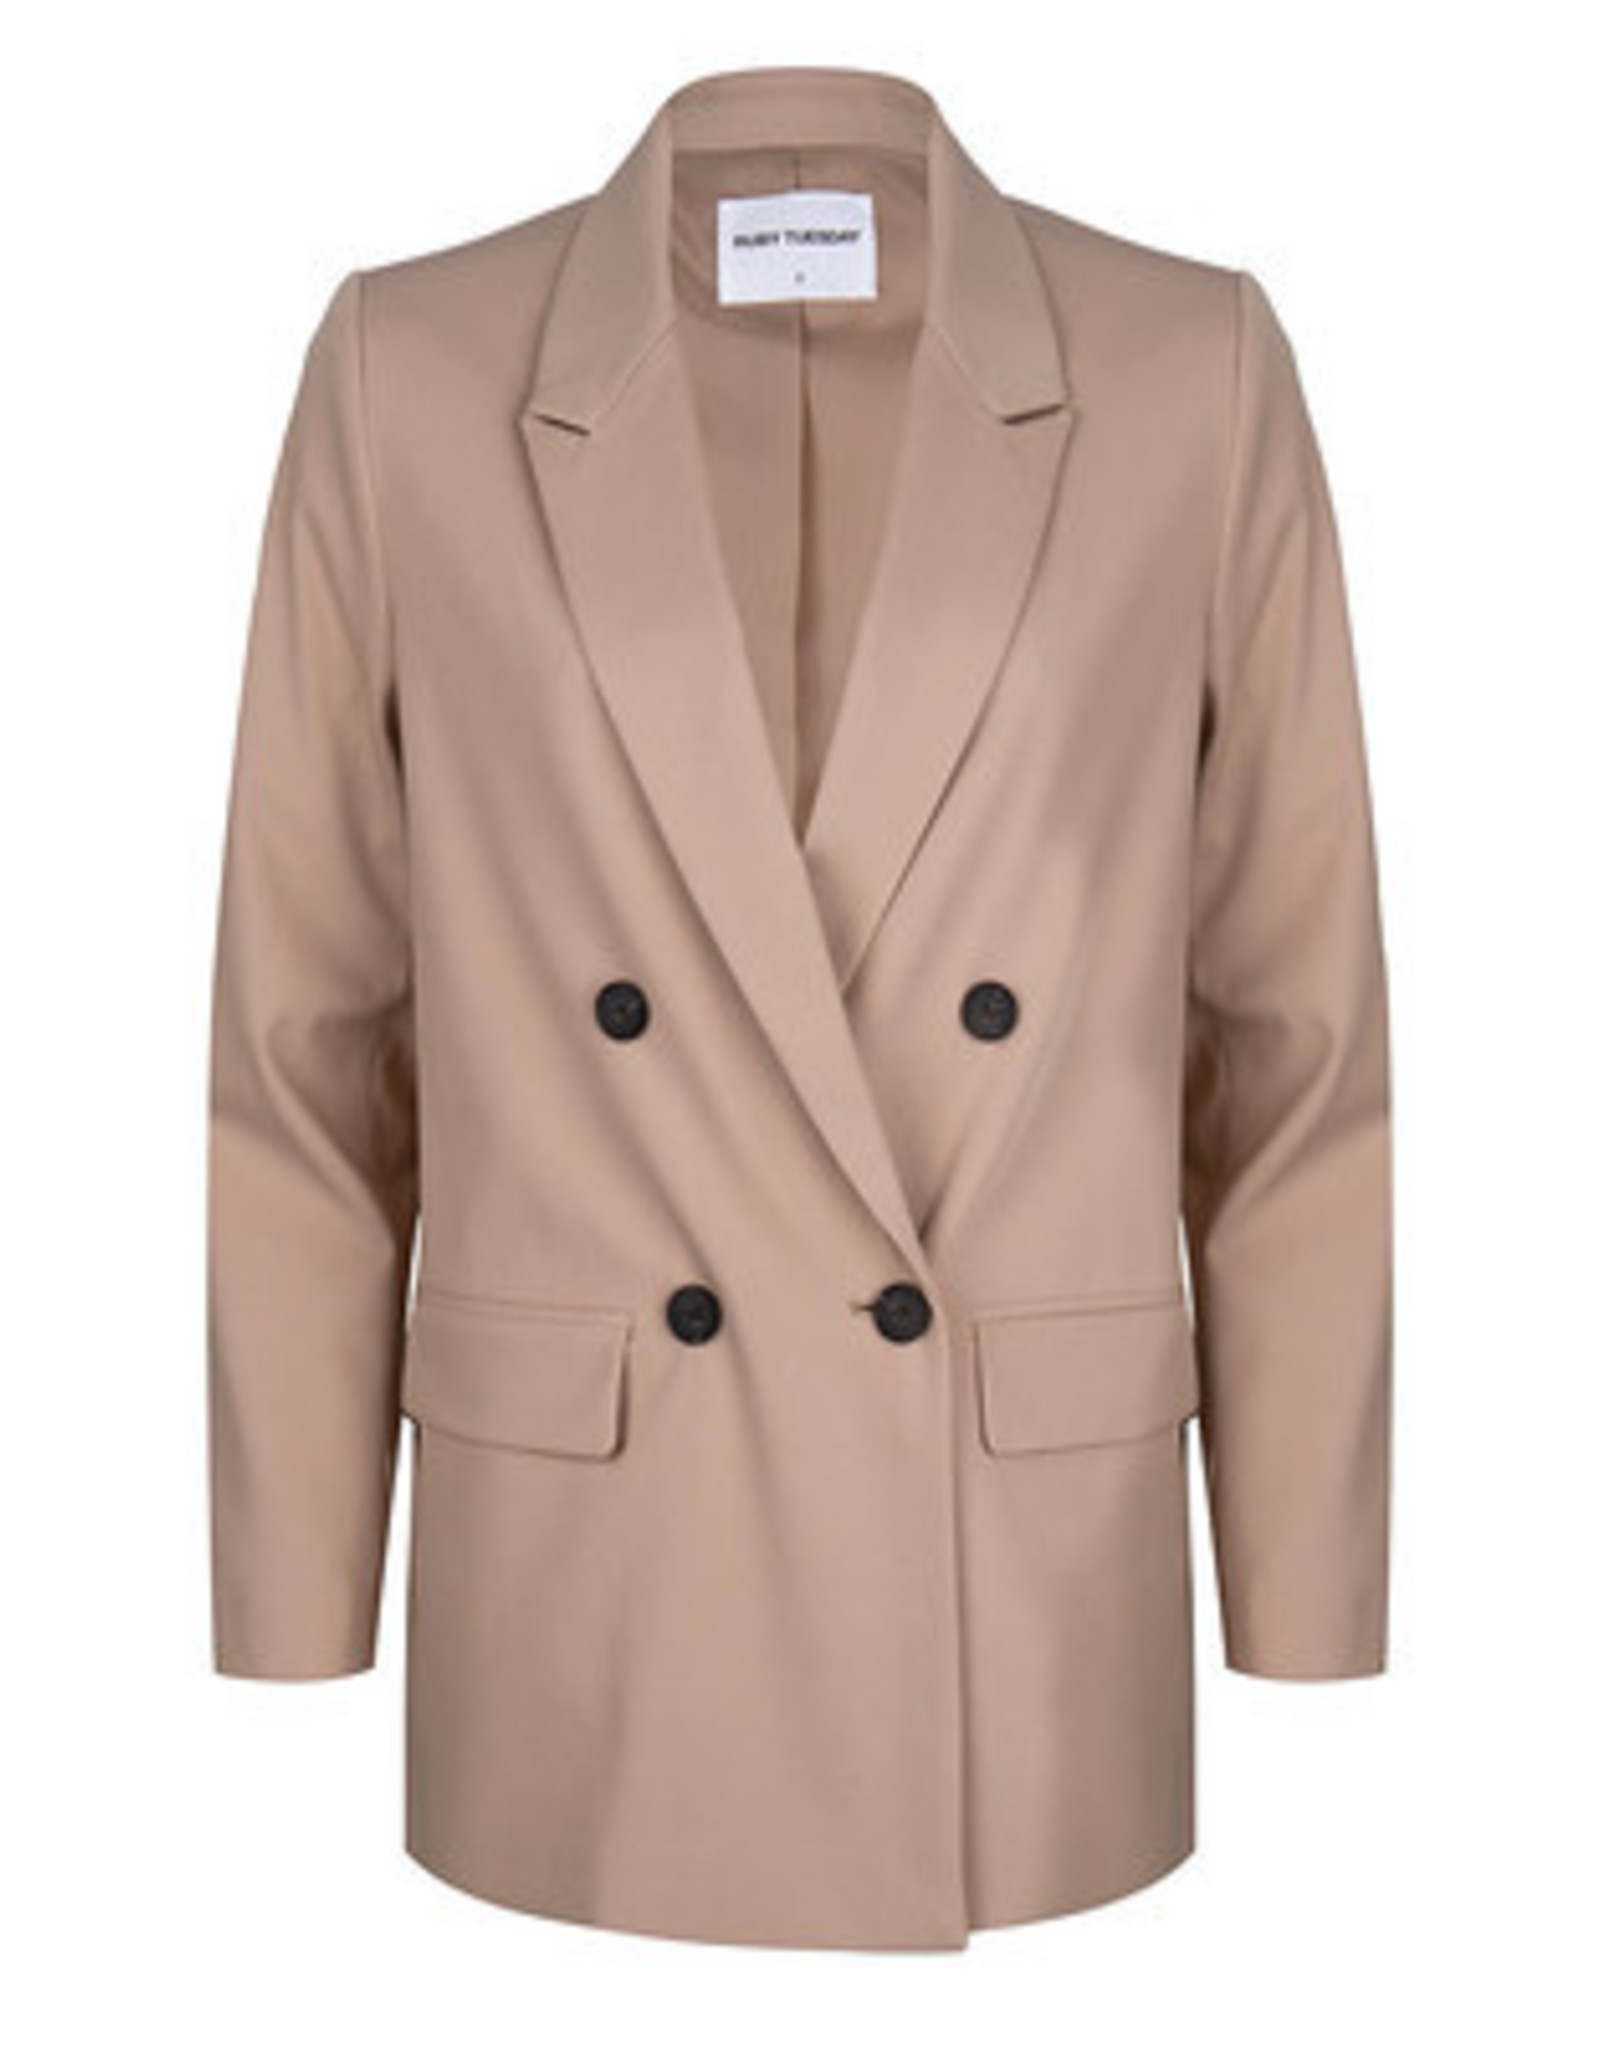 Ruby Tuesday Rai double breasted blazer beige